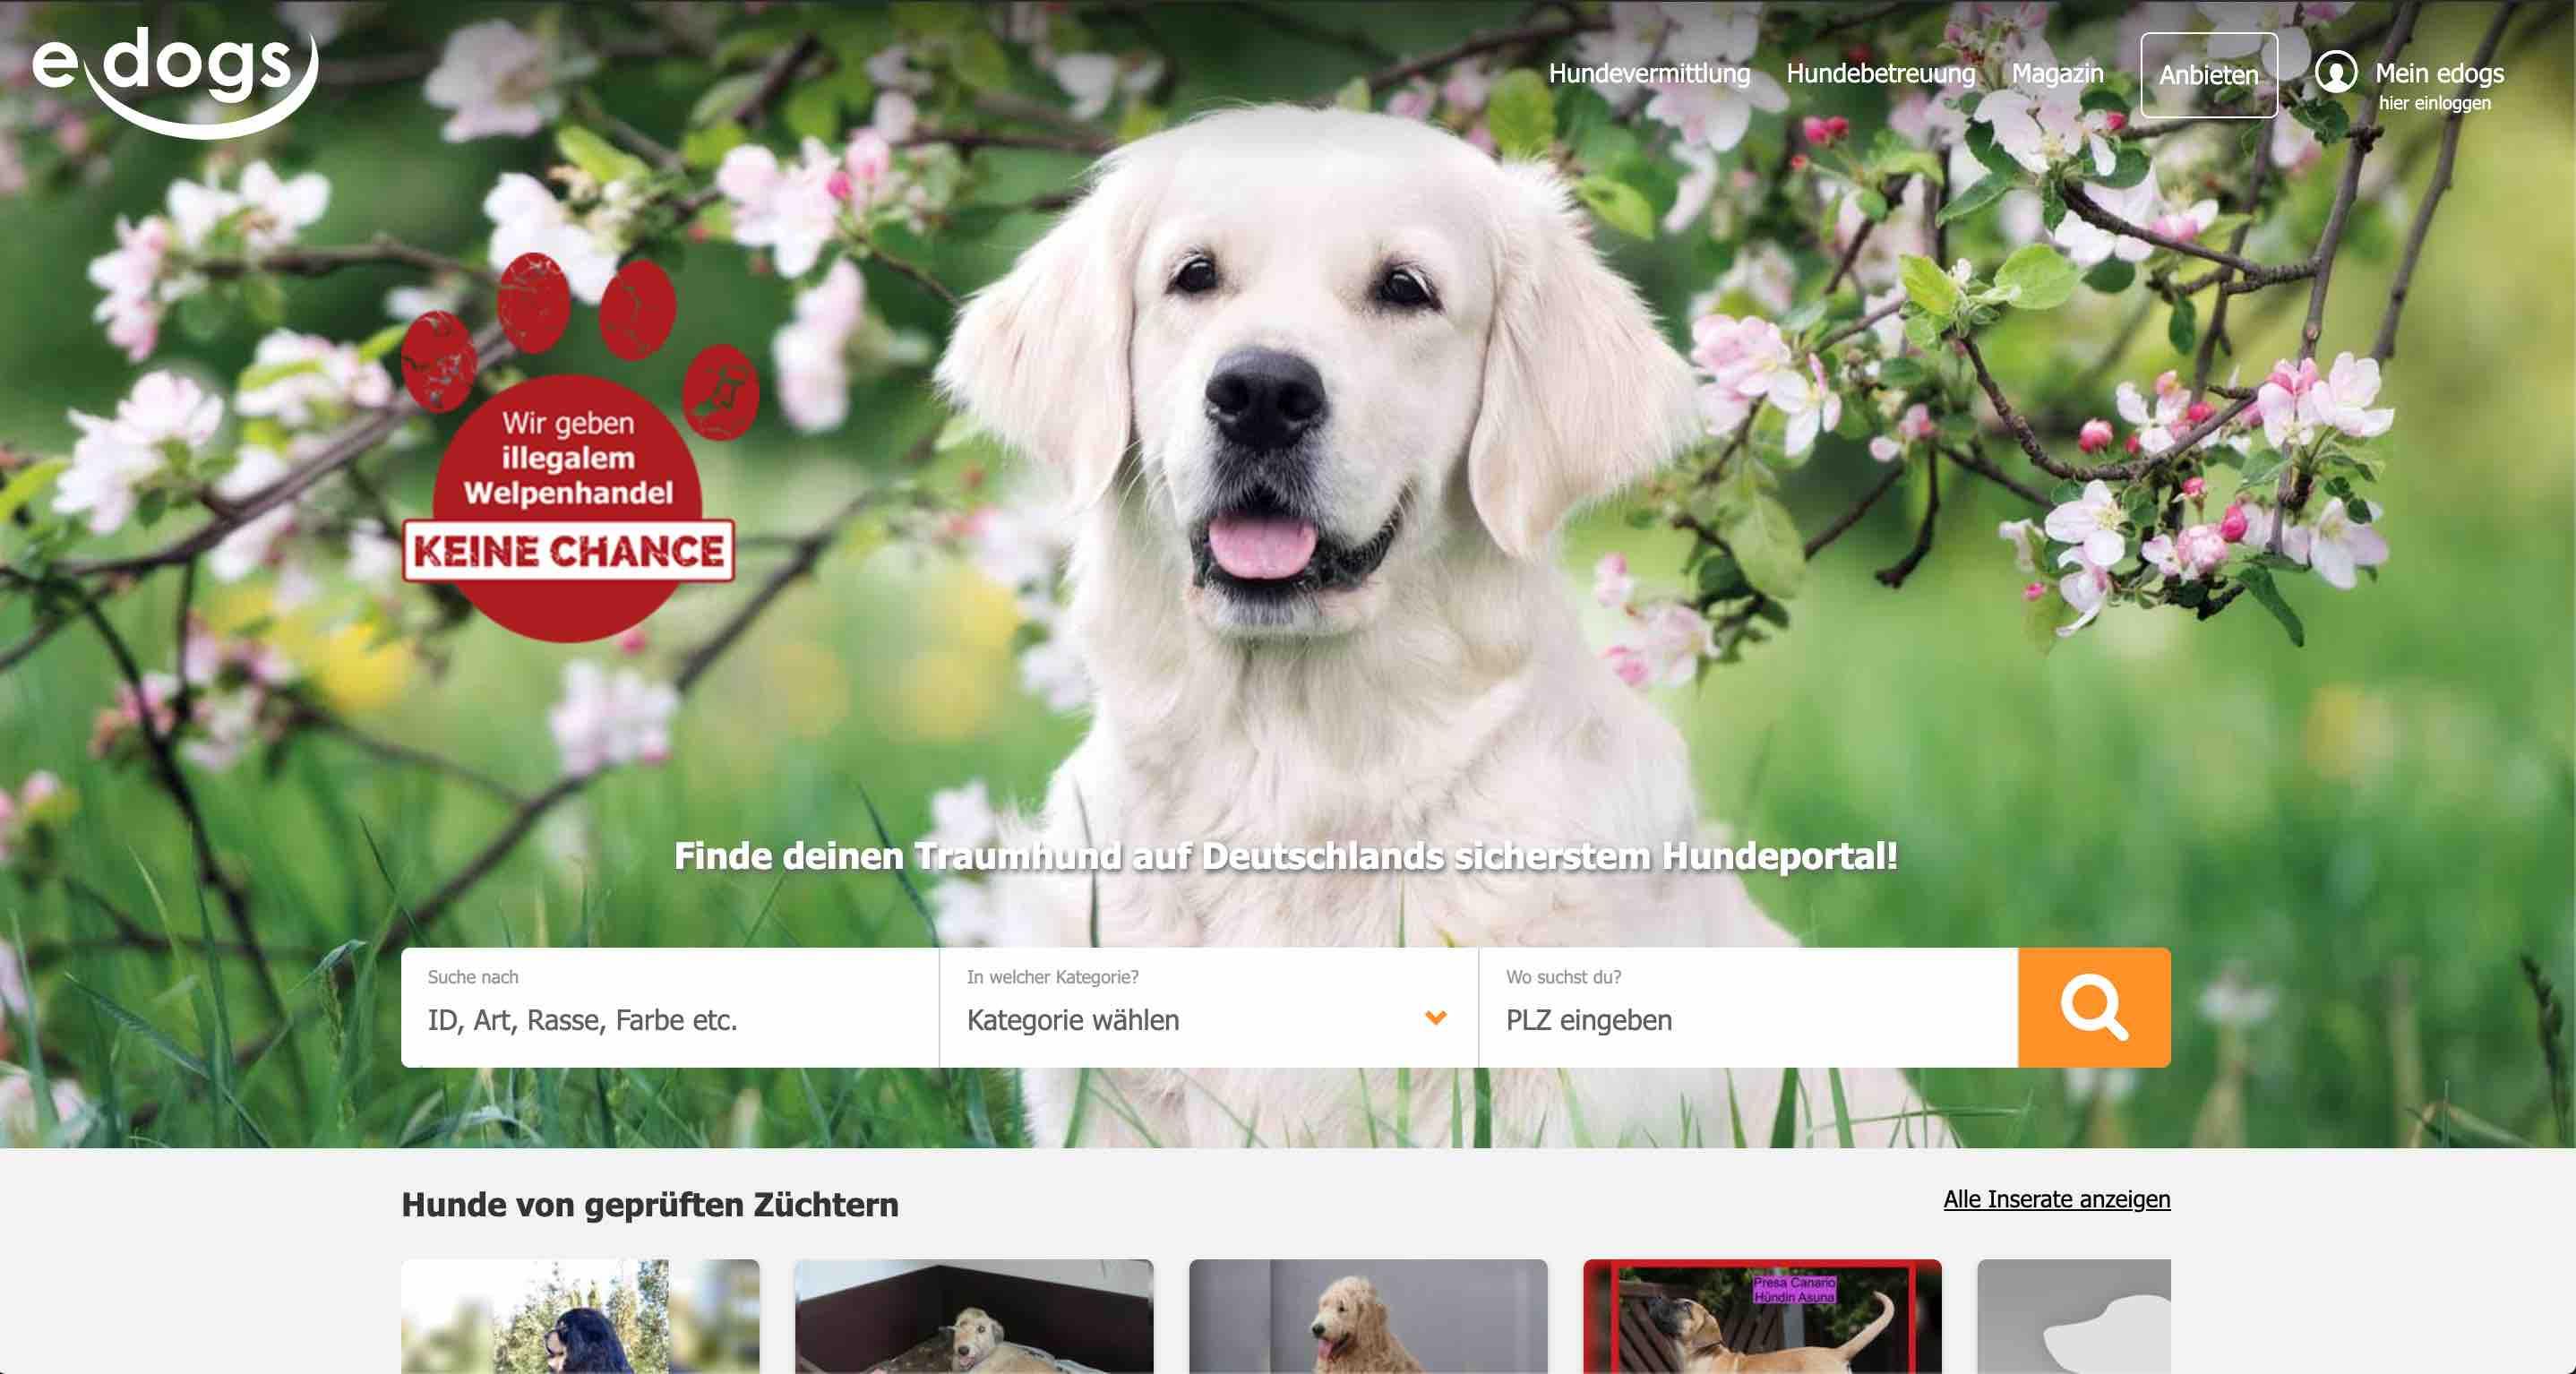 Lokalzeitung NOZ Mediens Hunde Website Image